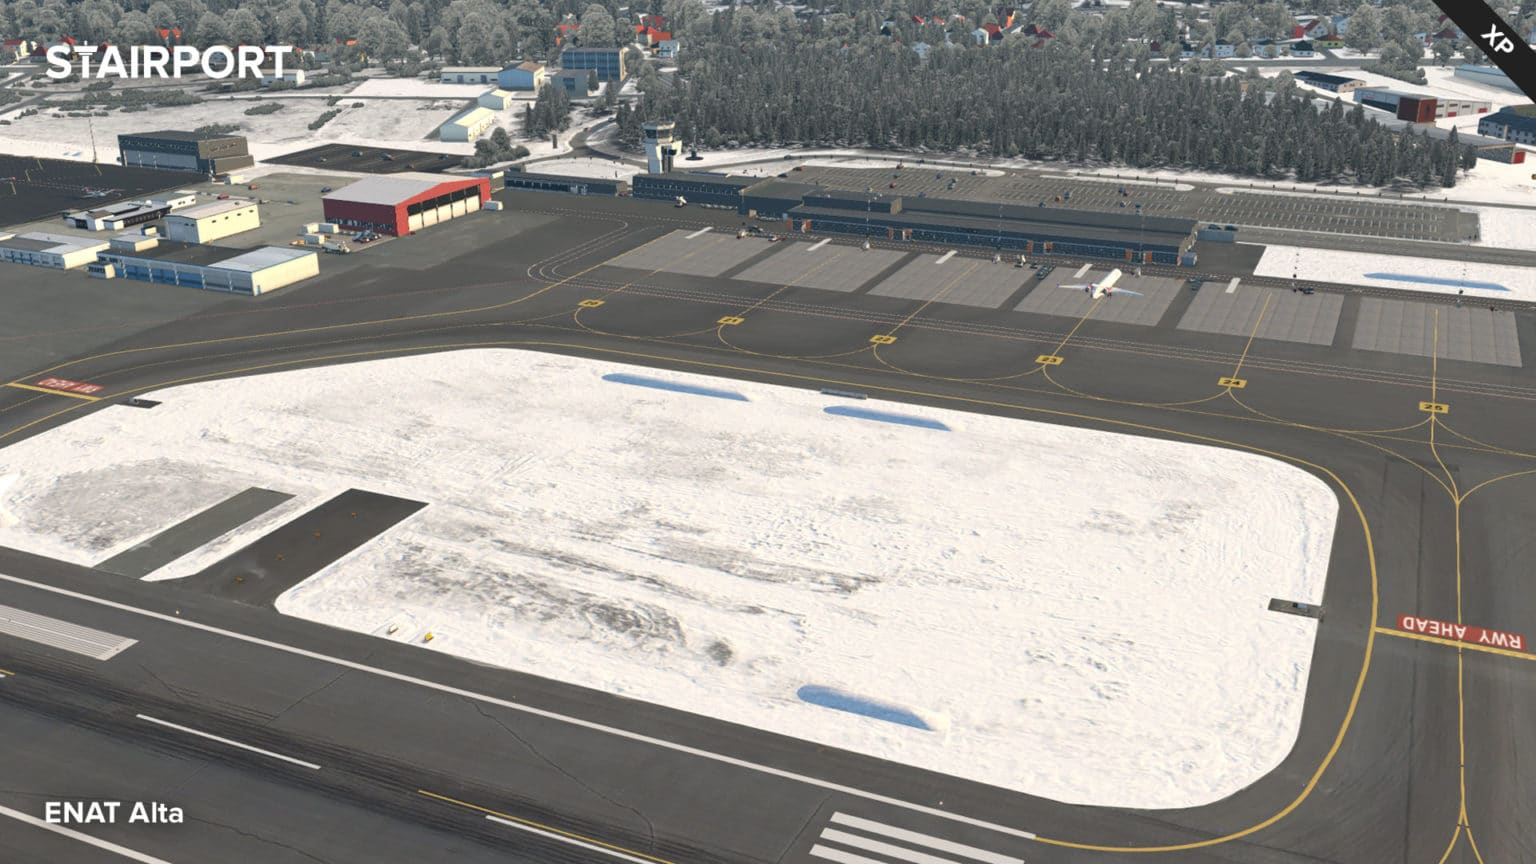 Stairport Alta X-Plane (3)